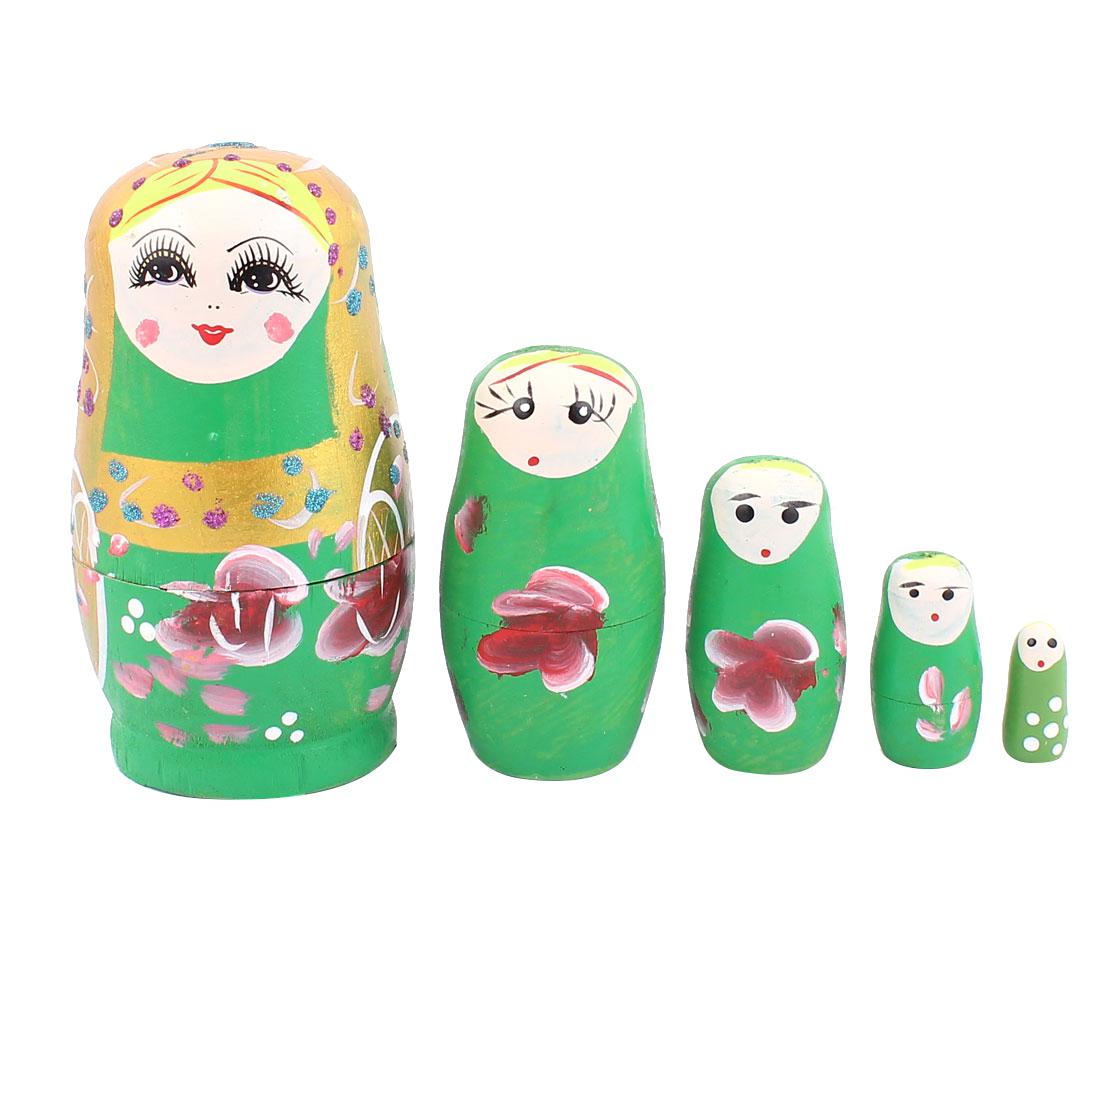 Russian Babushka Flowers Painted Stacking Nesting Matryoshka Doll Green 5 in 1